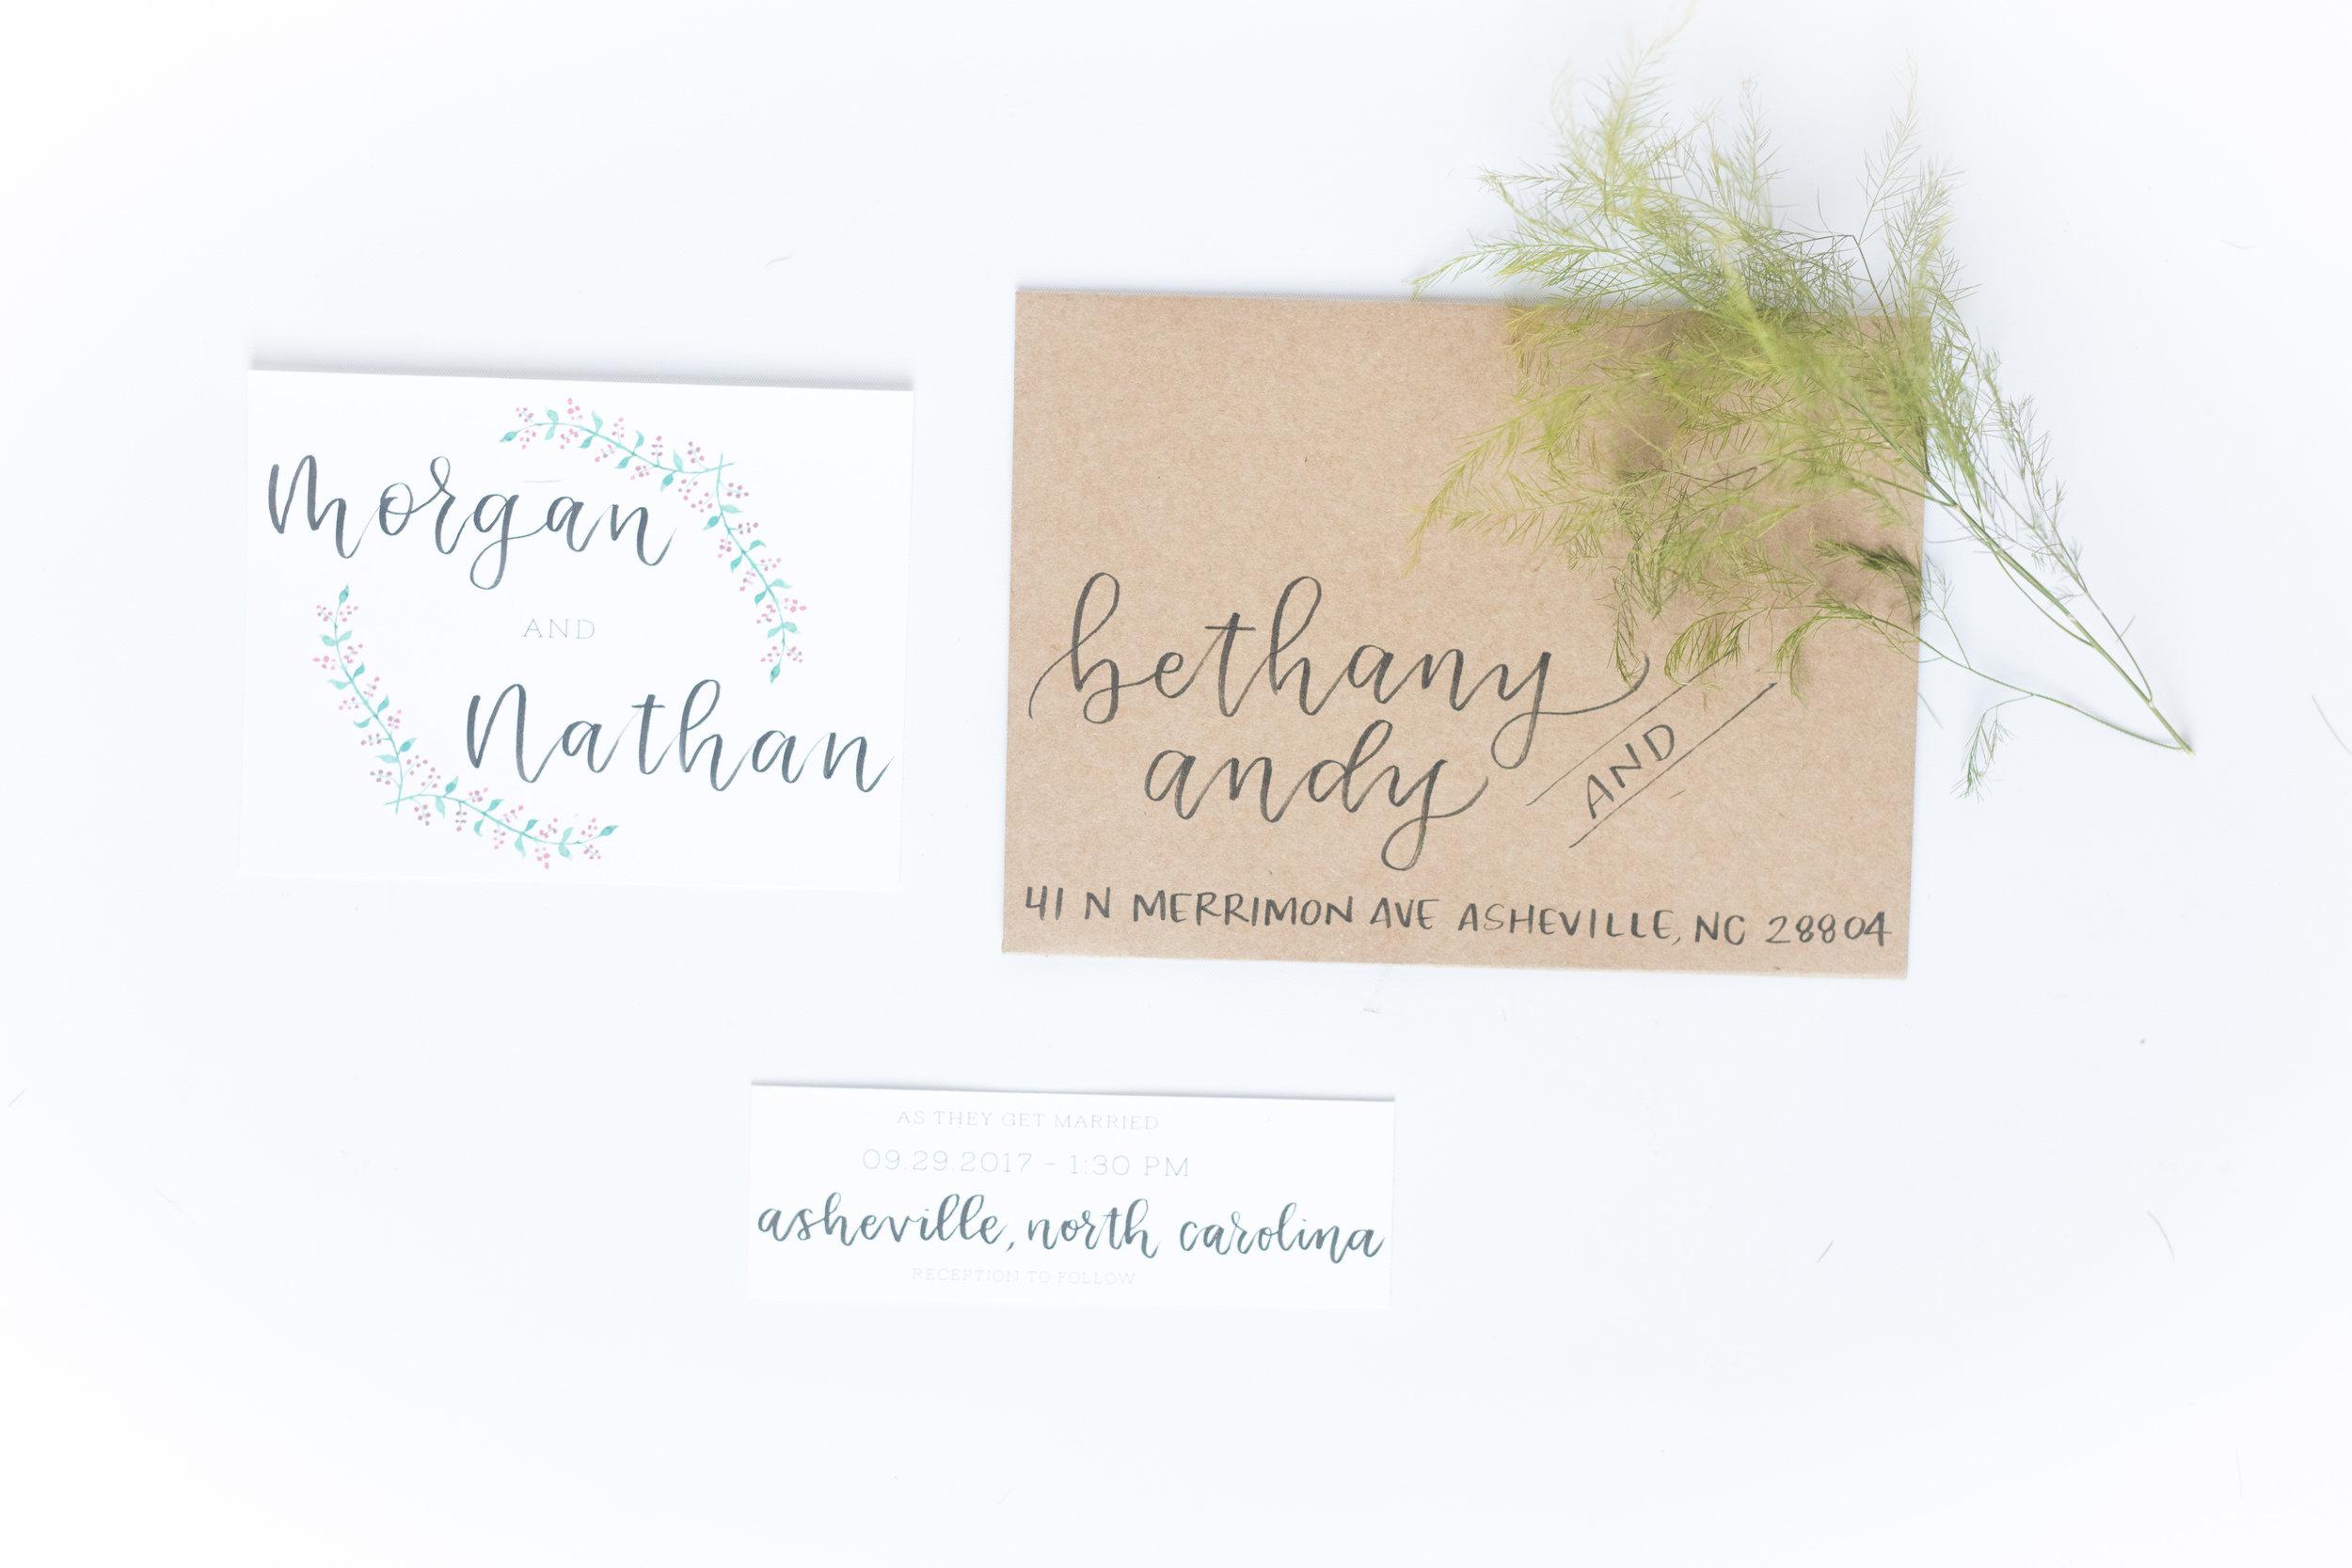 Engaged-Asheville-Joy-Unscripted-Wedding-Calligrapher-Kathy-Beaver-Photography-3.jpg